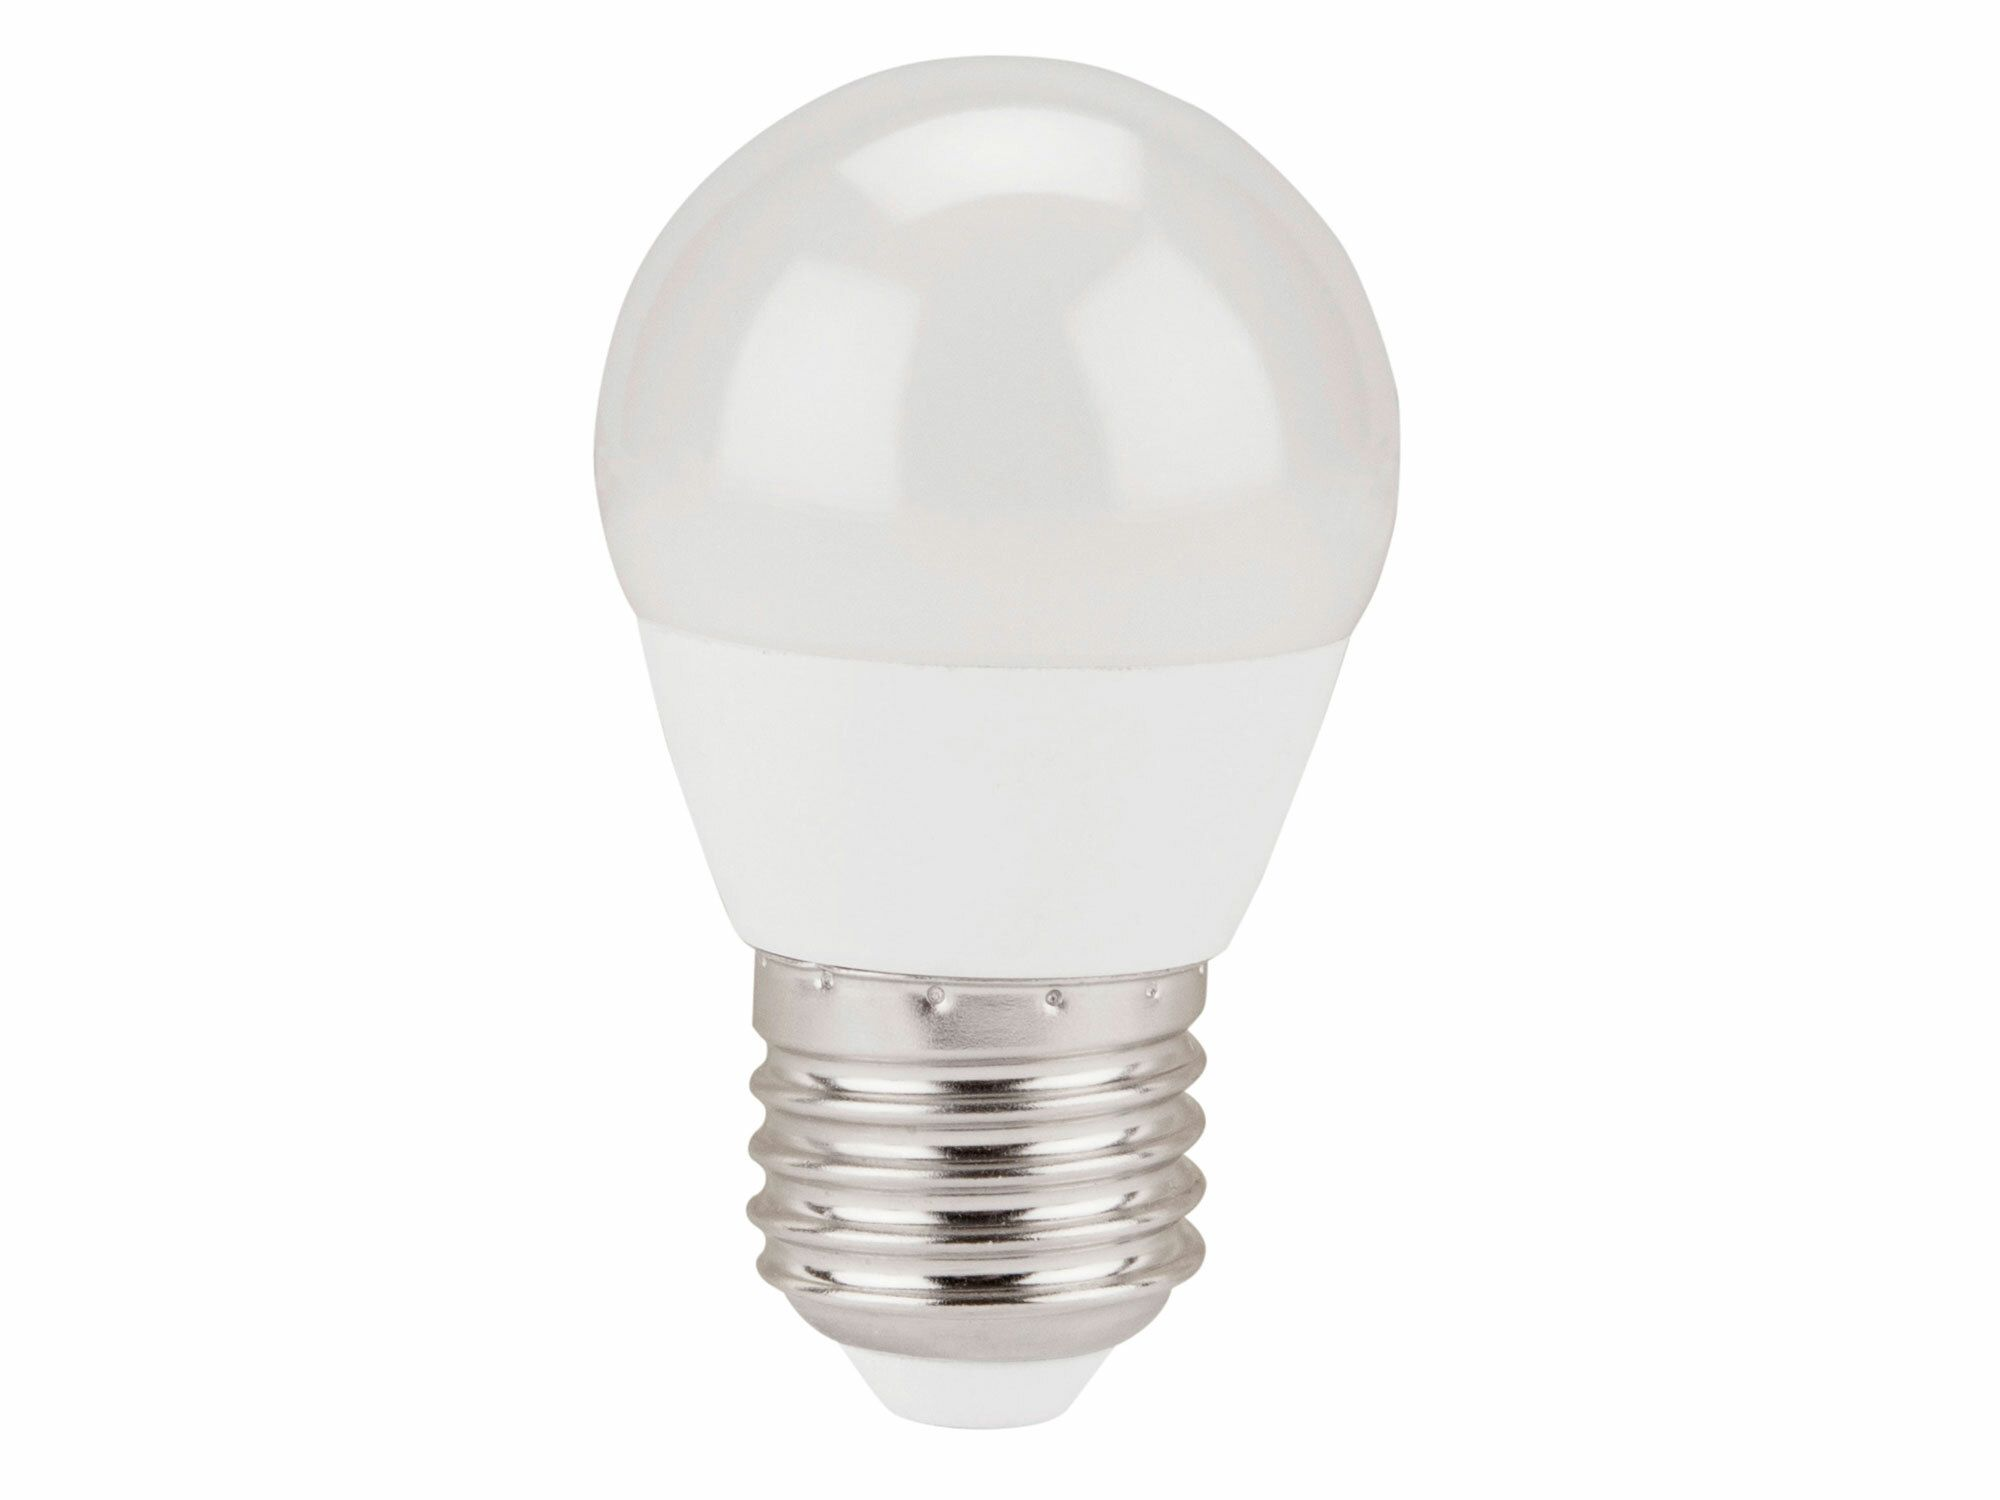 Žárovka LED mini, 5W, 410lm, E27, teplá bílá EXTOL-LIGHT